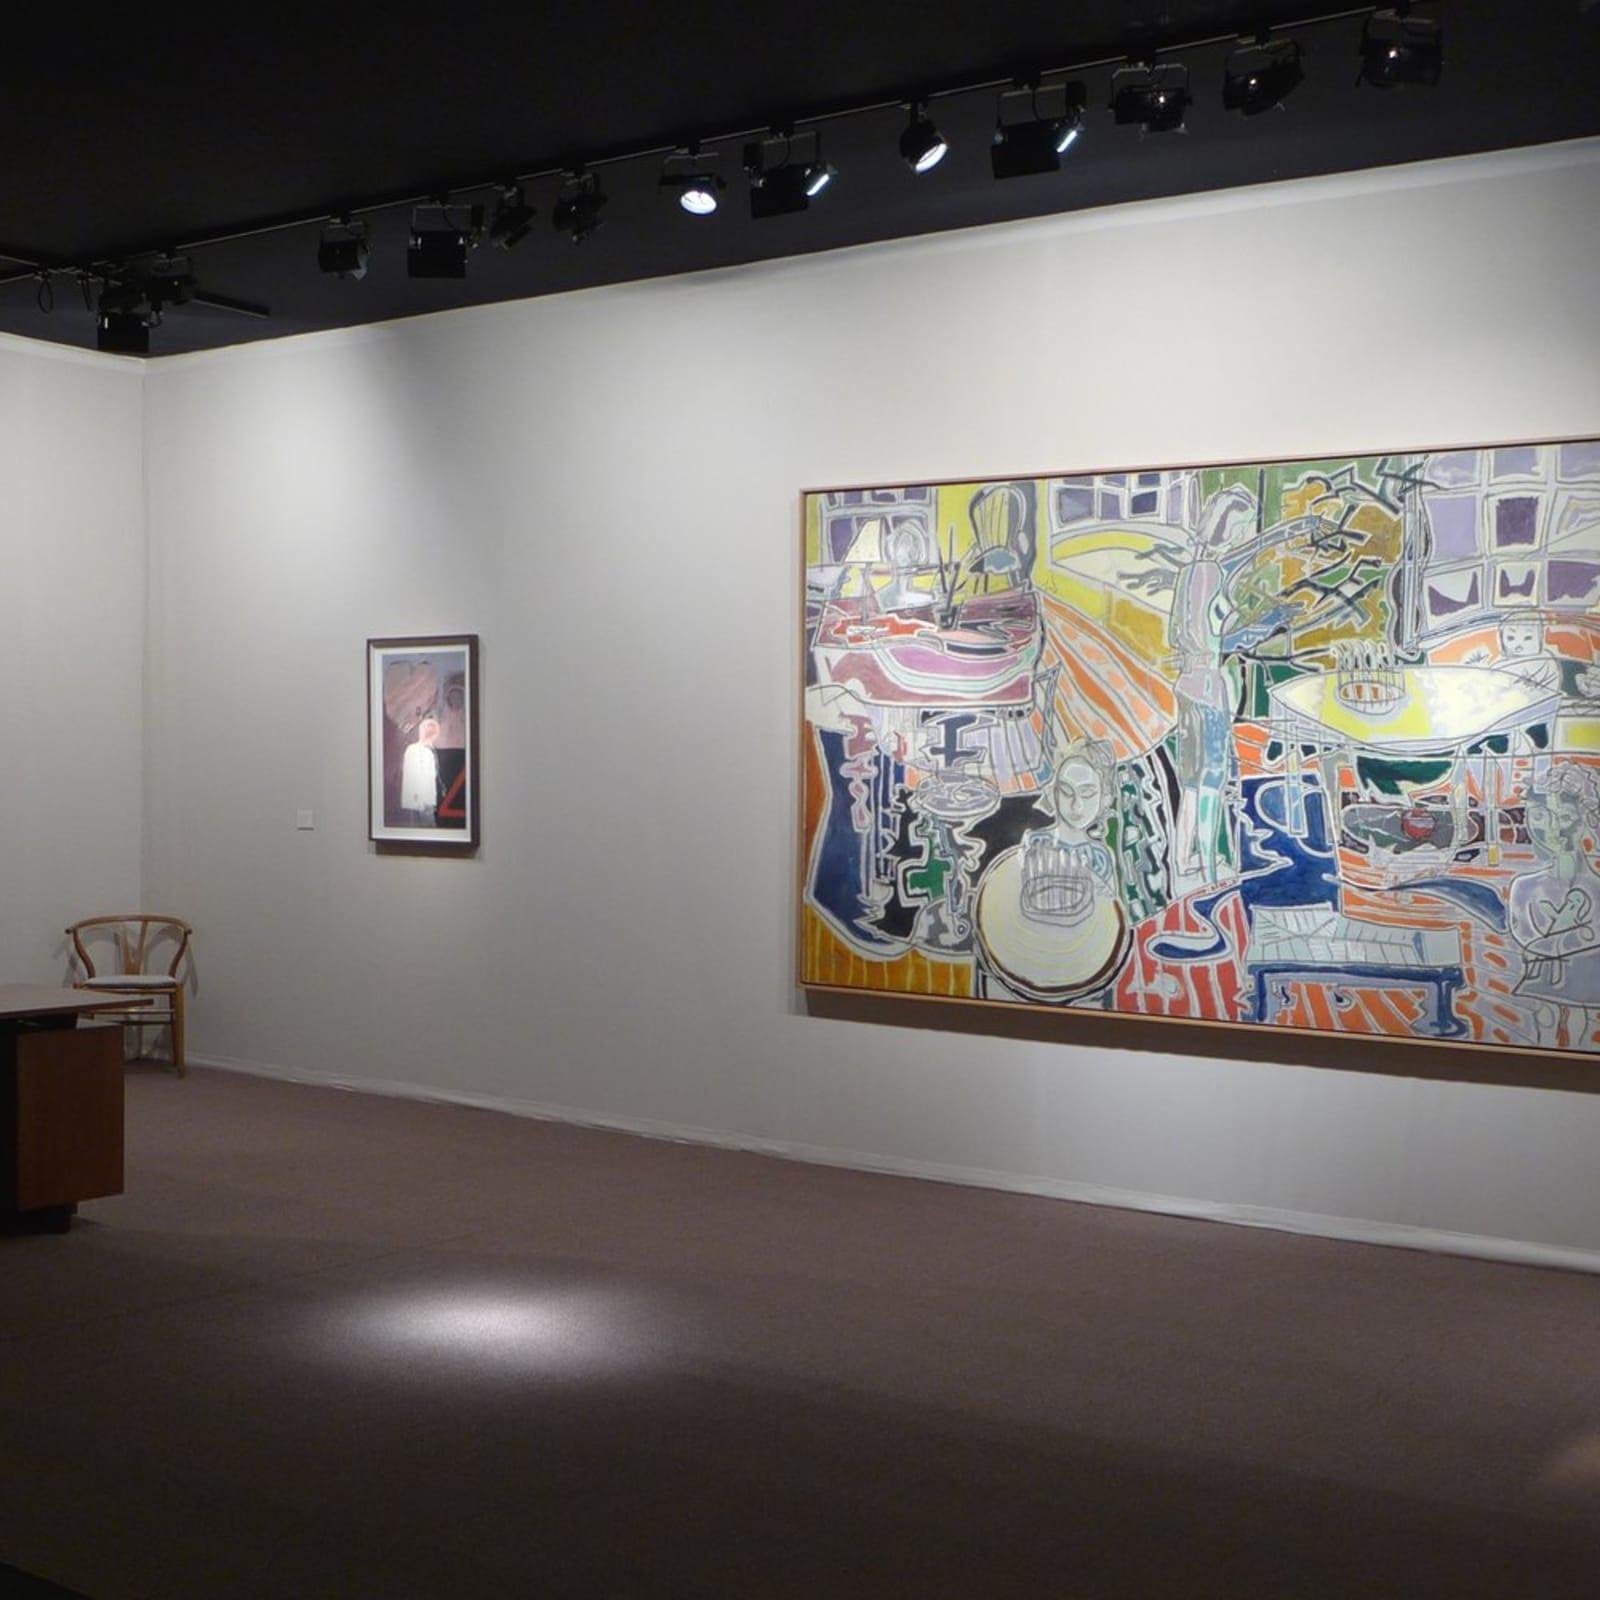 Left to right: Leon Kossoff, David Hockney, Patrick Heron and Grayson Perry